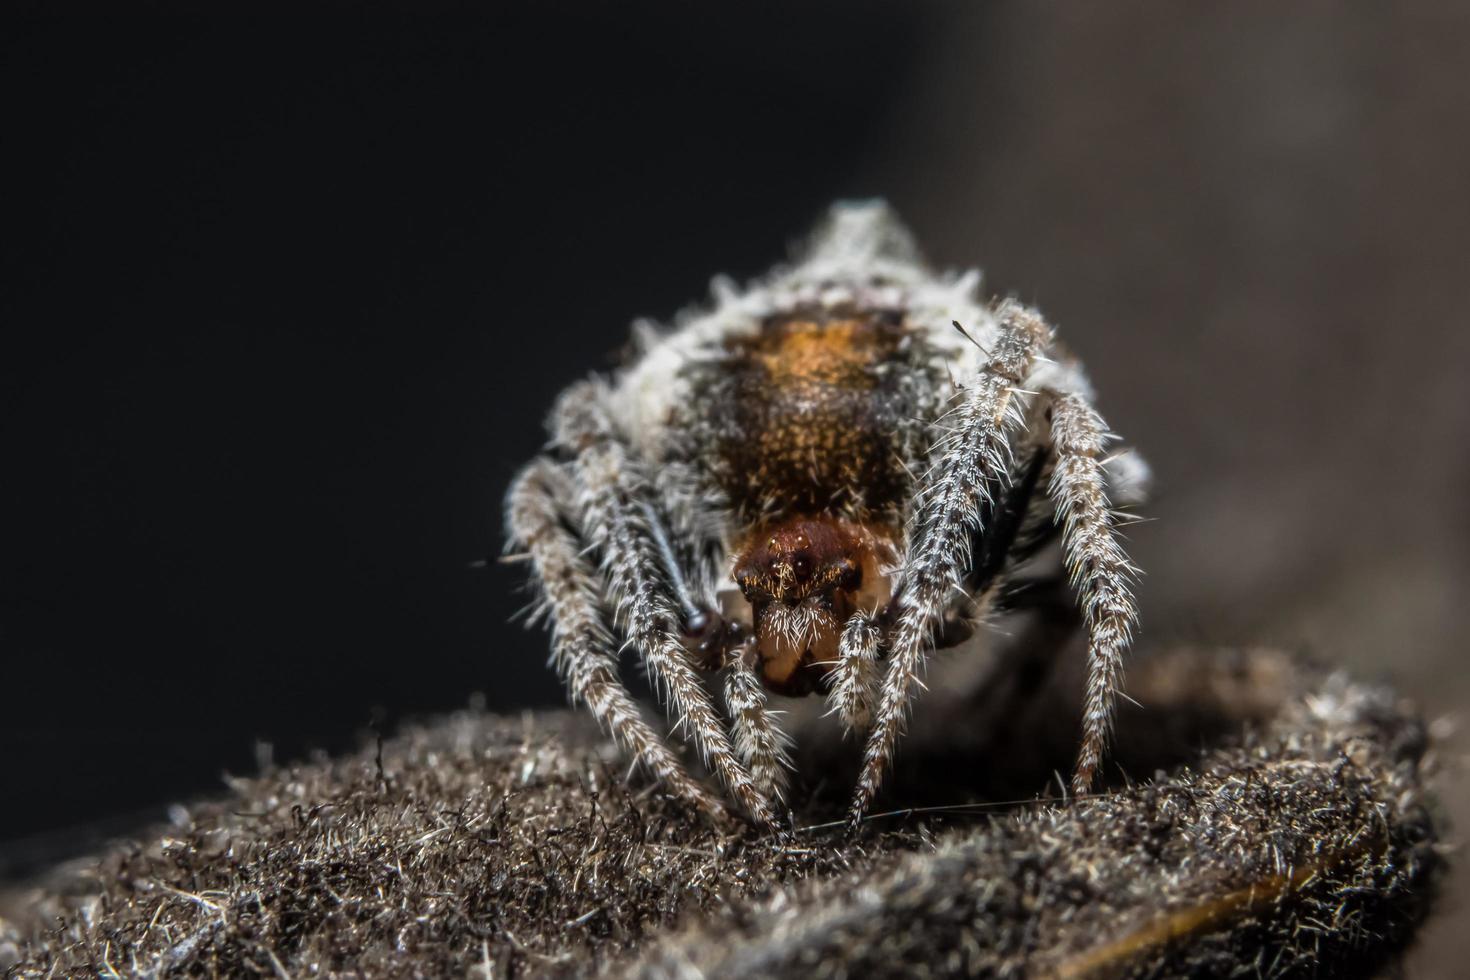 Spinne, Nahaufnahmefoto foto